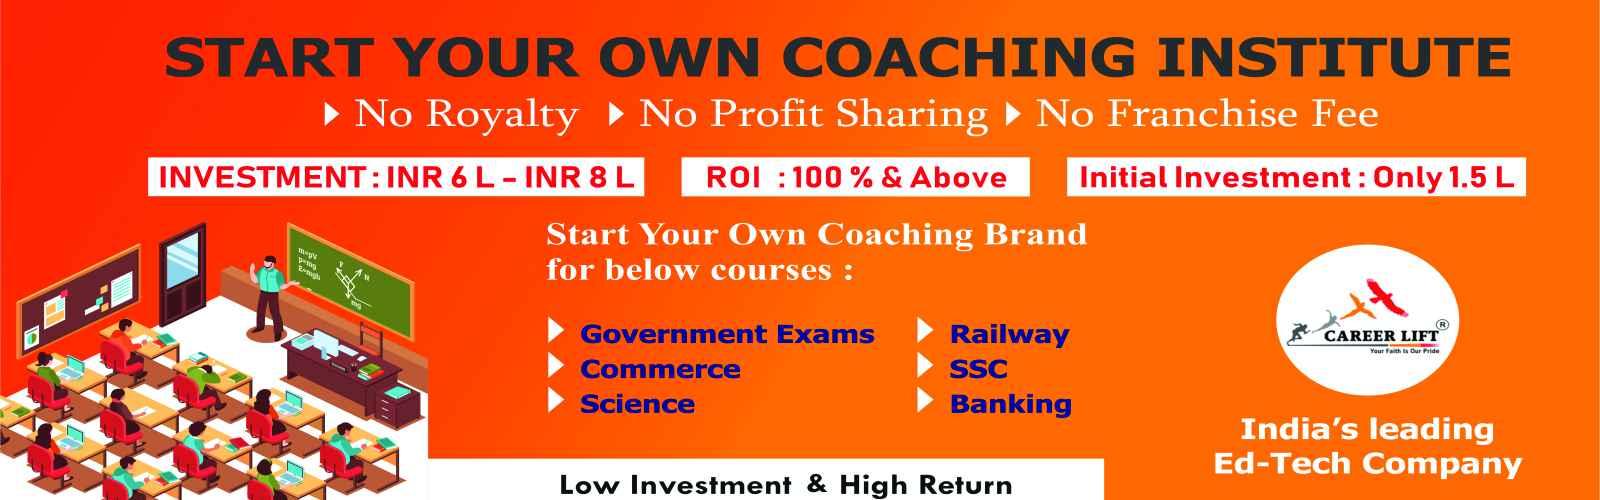 admin/photos/Career Lift ( Country's leading Education Technology Company)